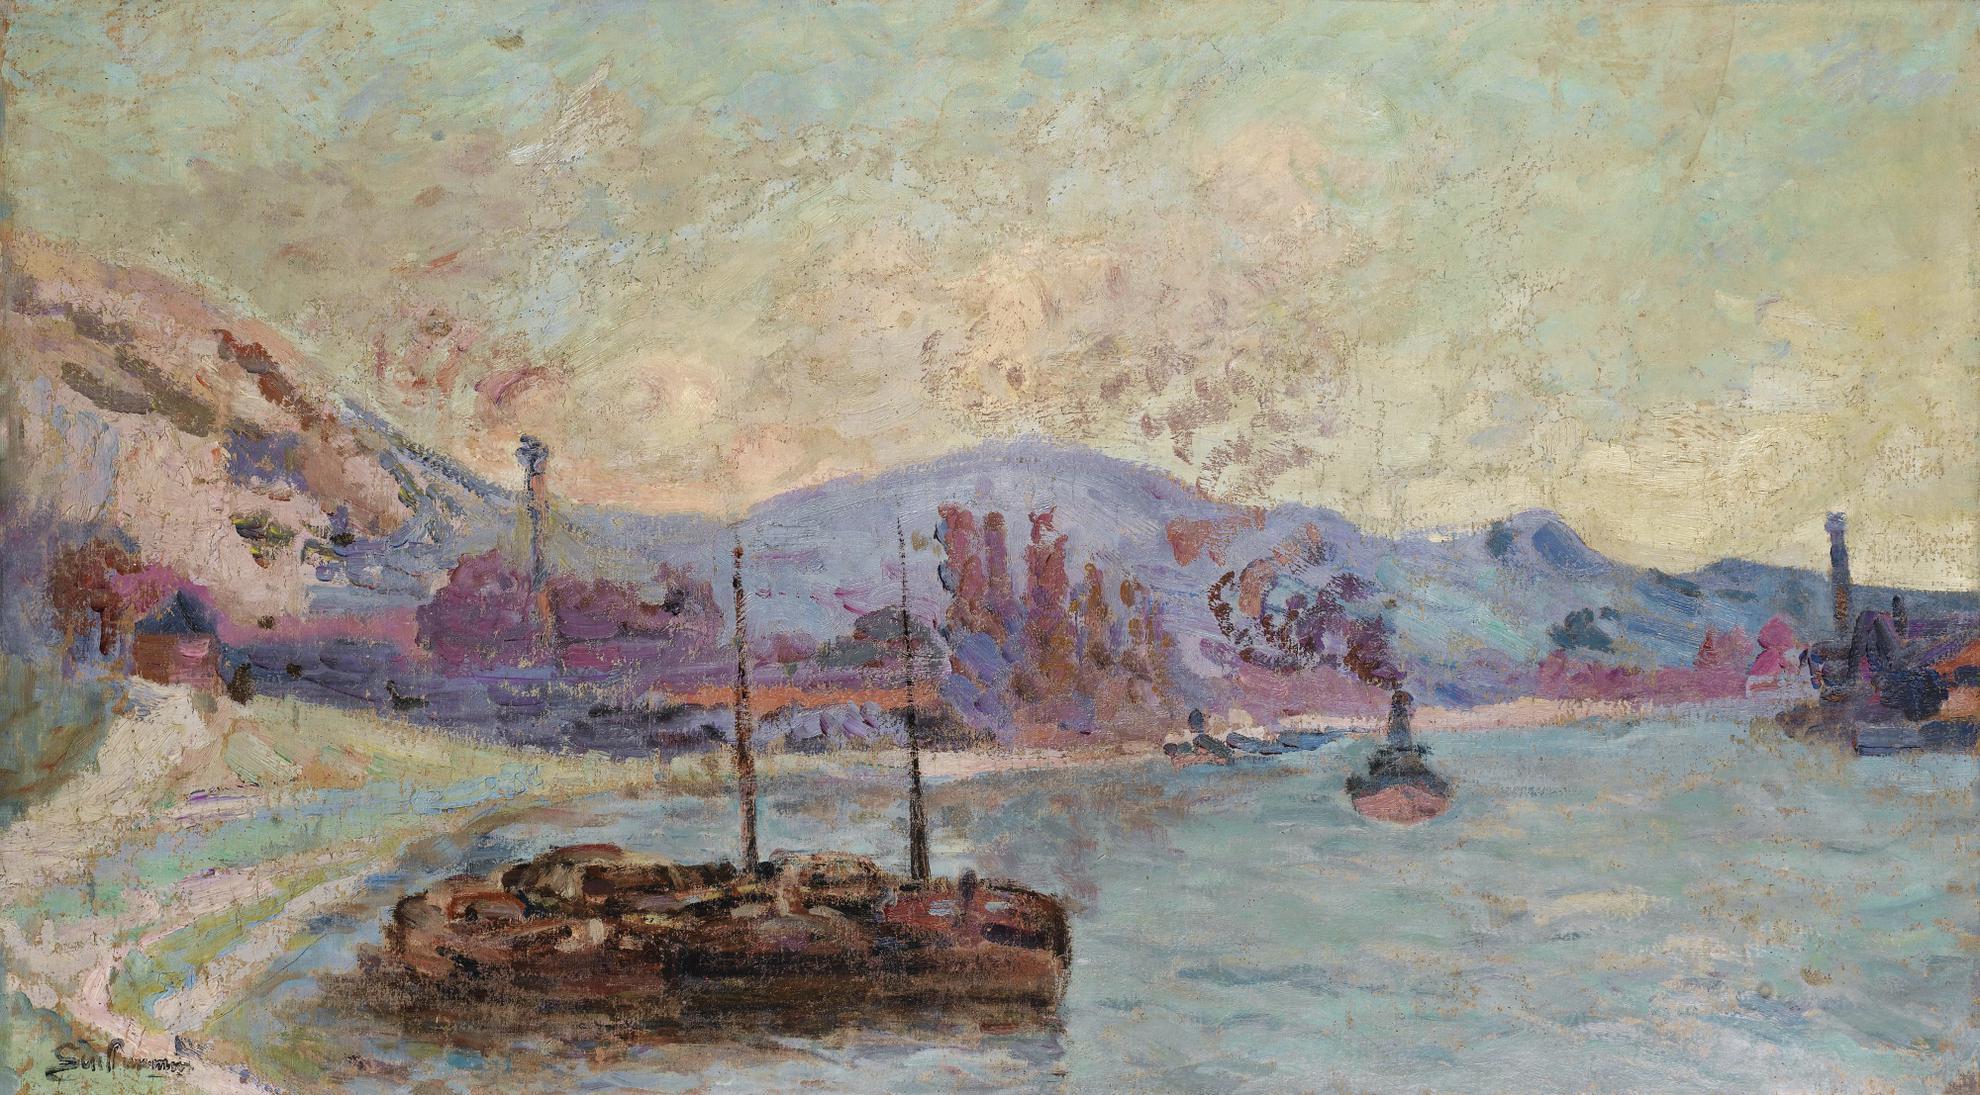 Jean-Baptiste Armand Guillaumin-Peniches Sur La Seine-1900